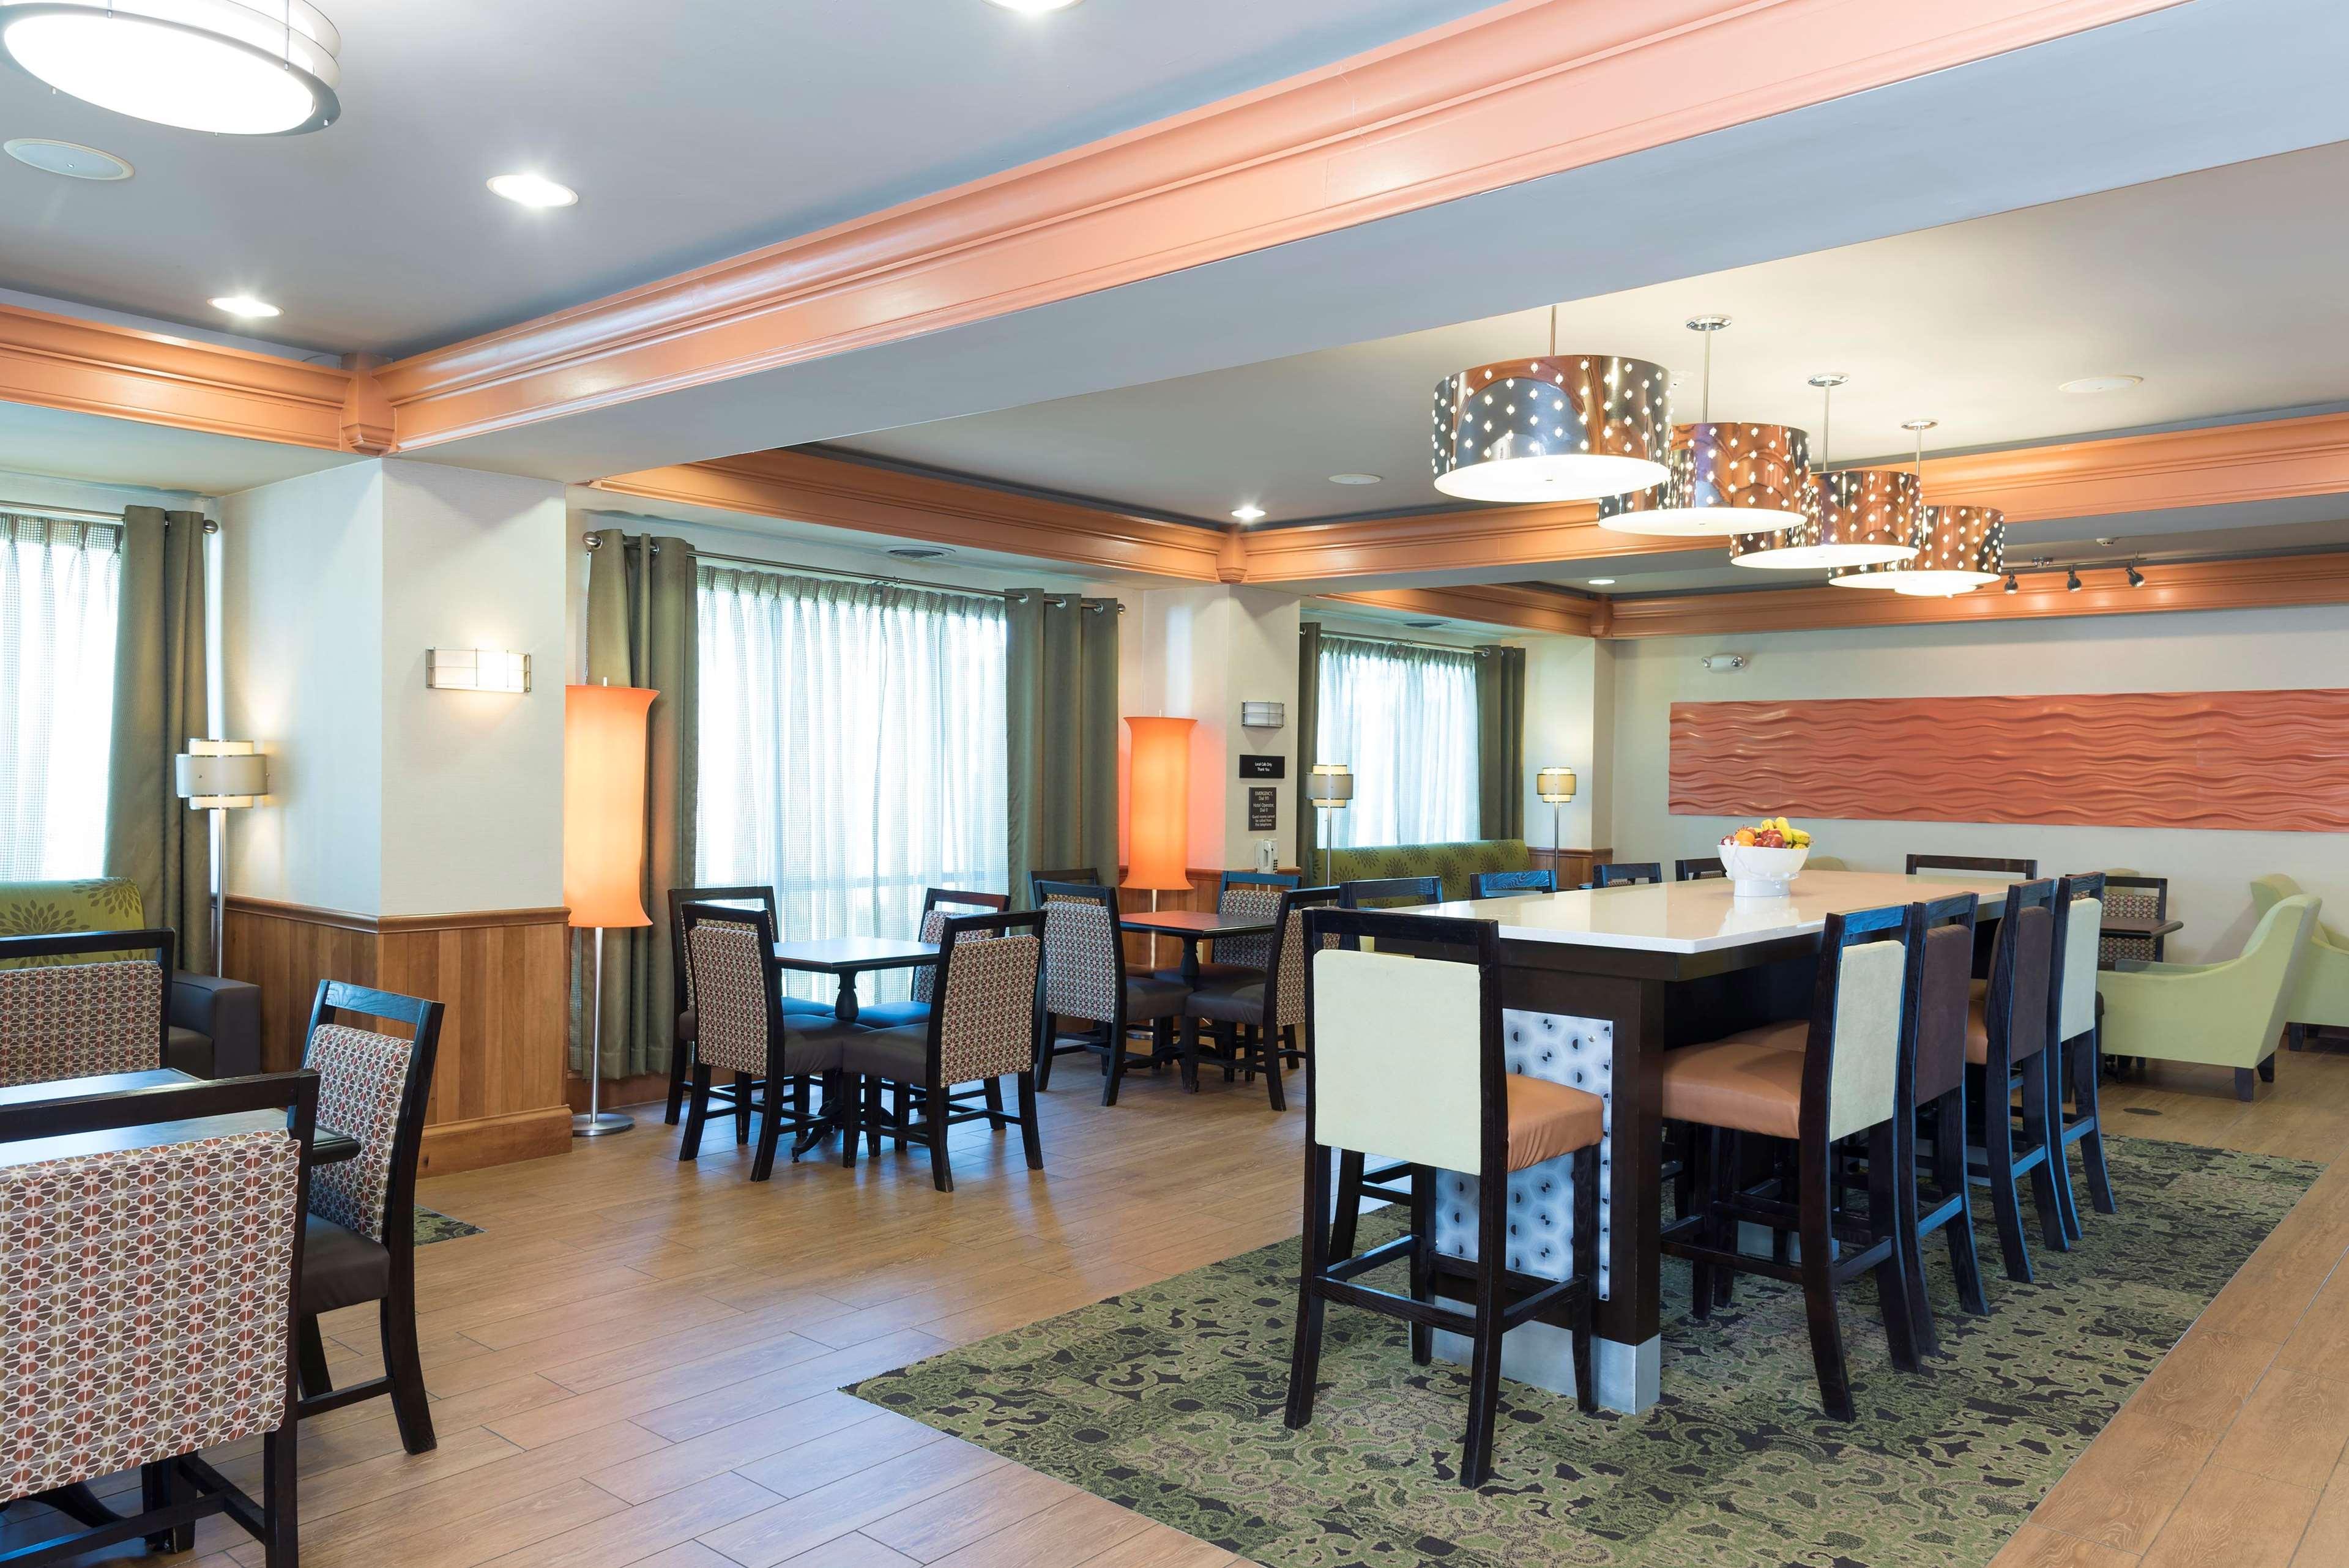 Hampton Inn & Suites Mansfield-South @ I-71 image 26